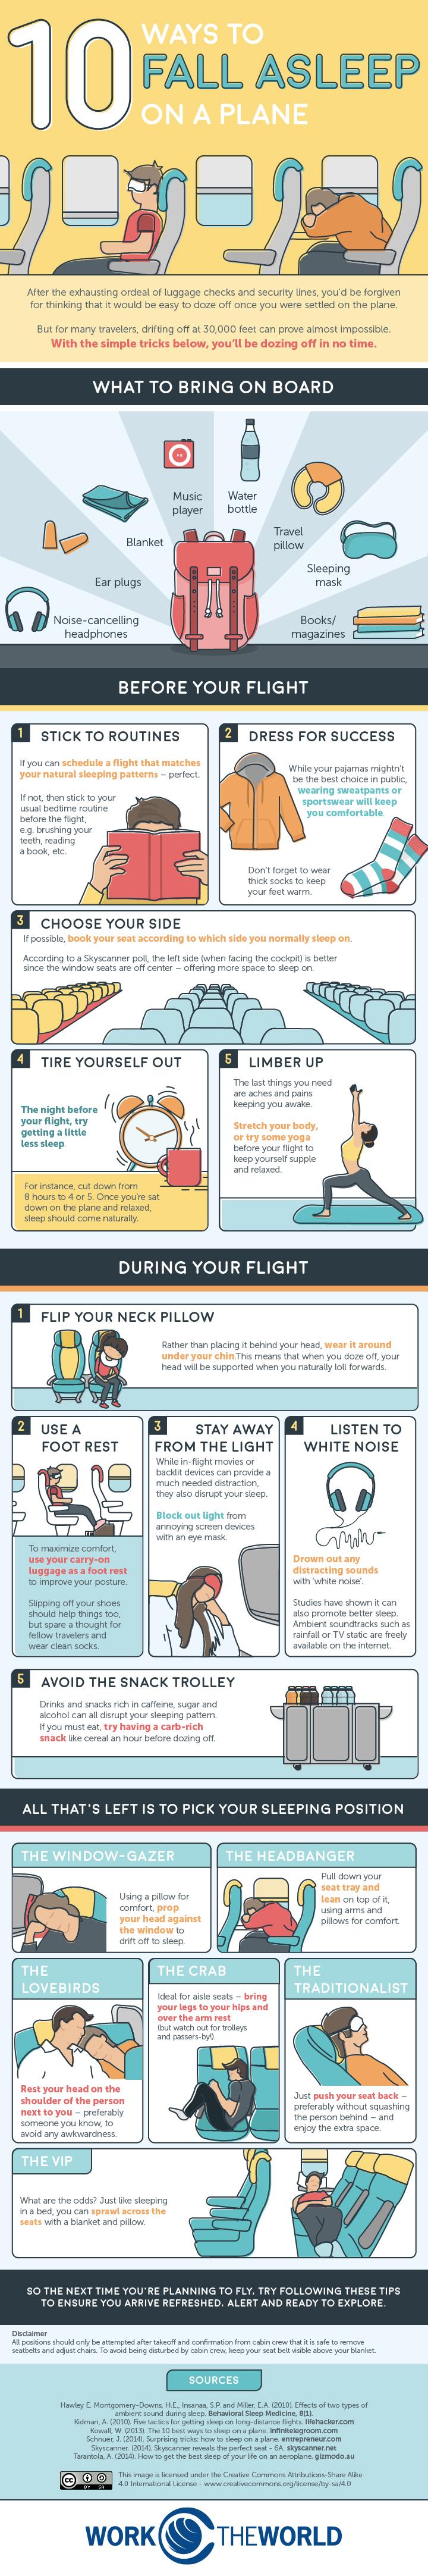 Sleep On A Plane